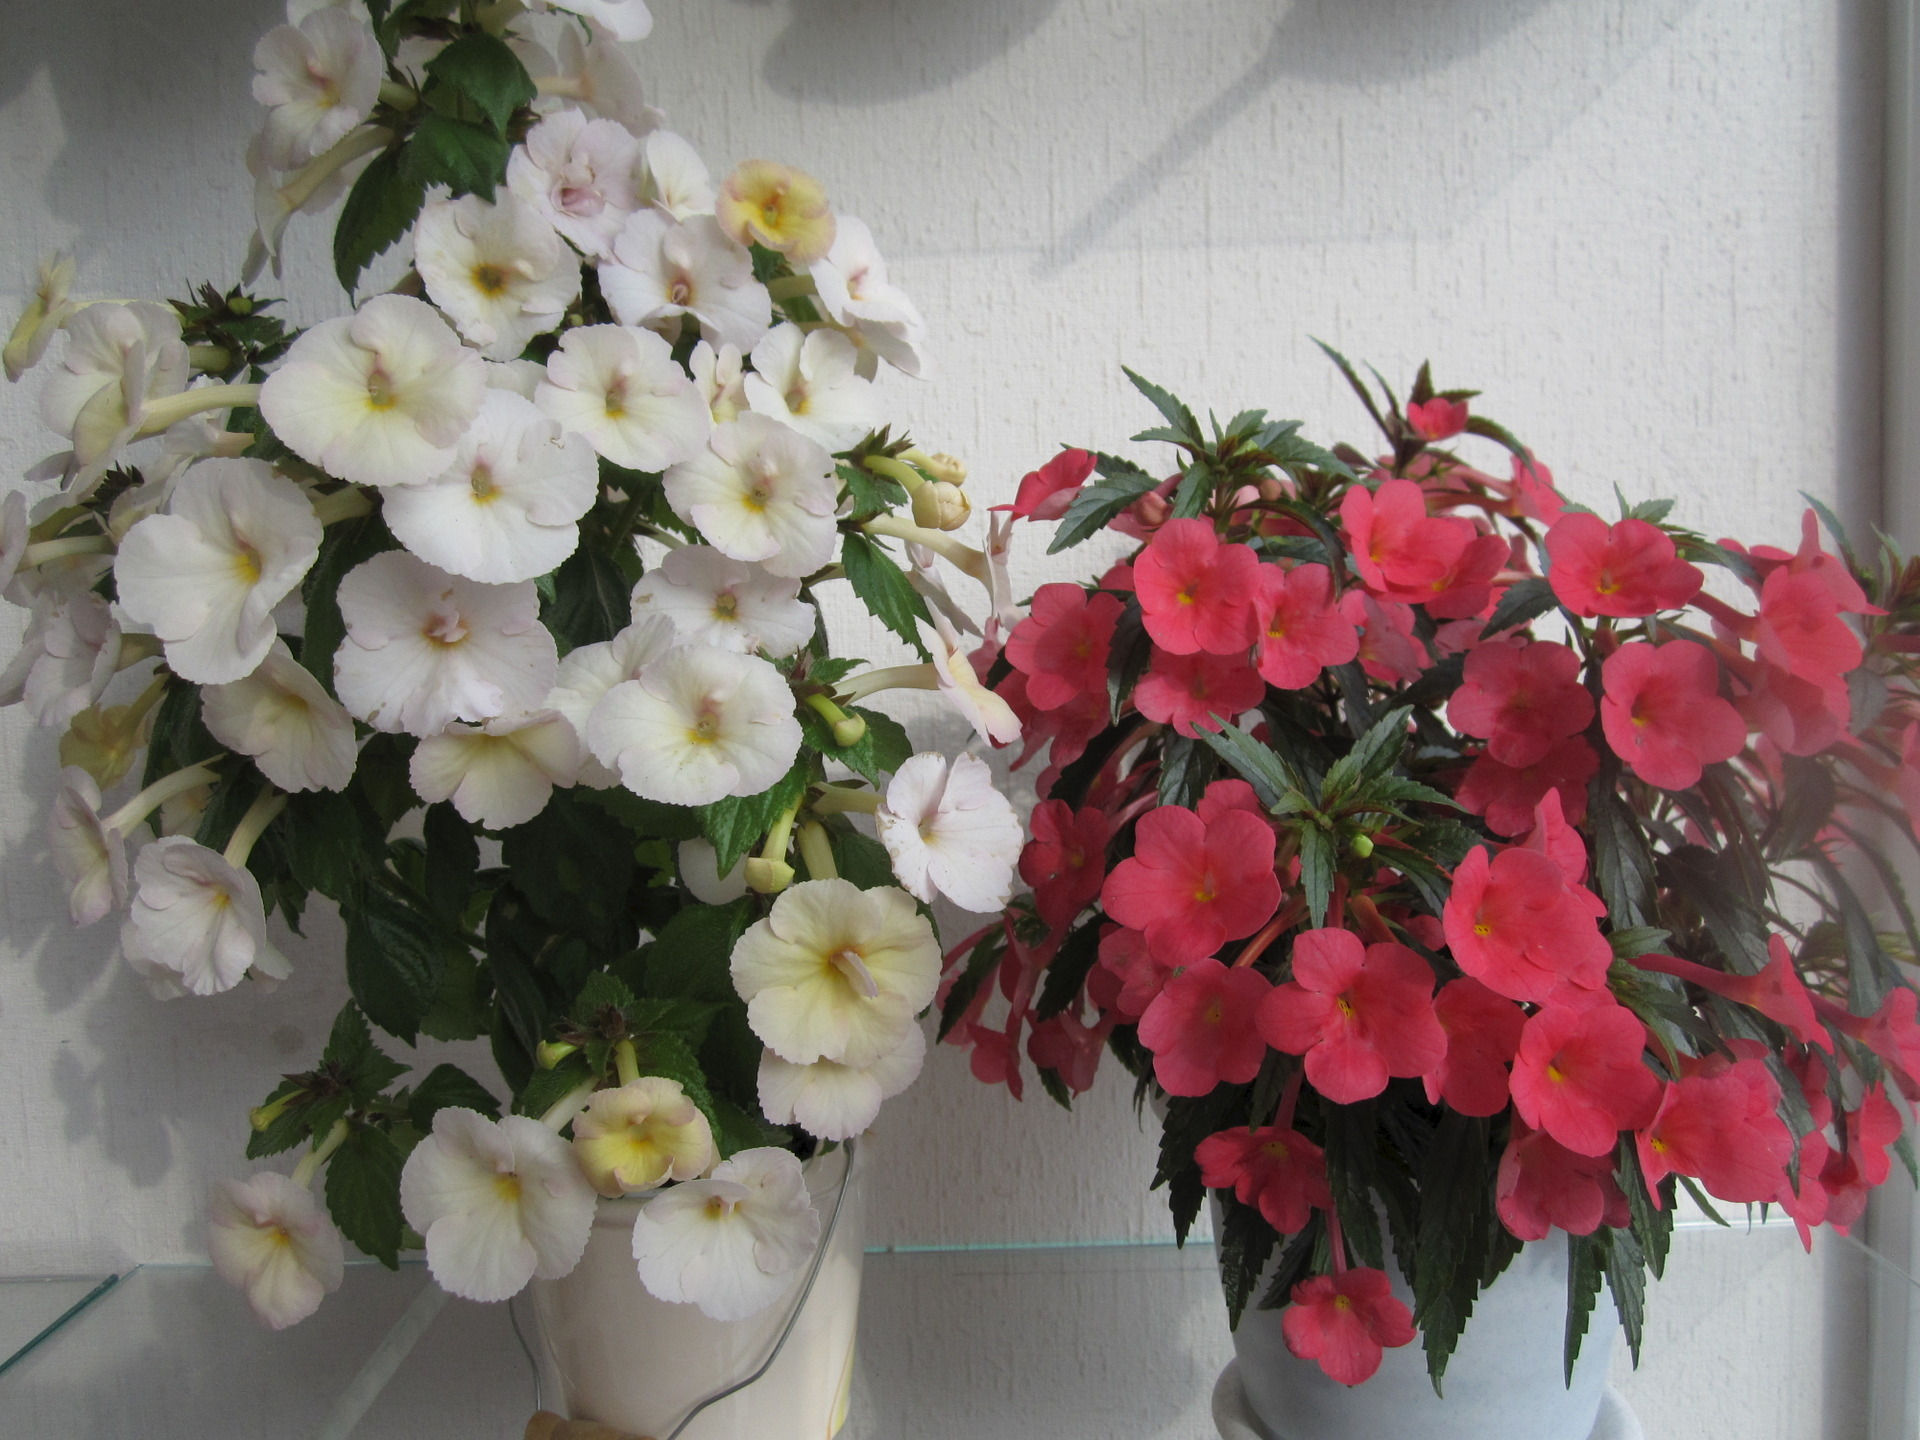 Комнатный цветок ахименес фото и уход